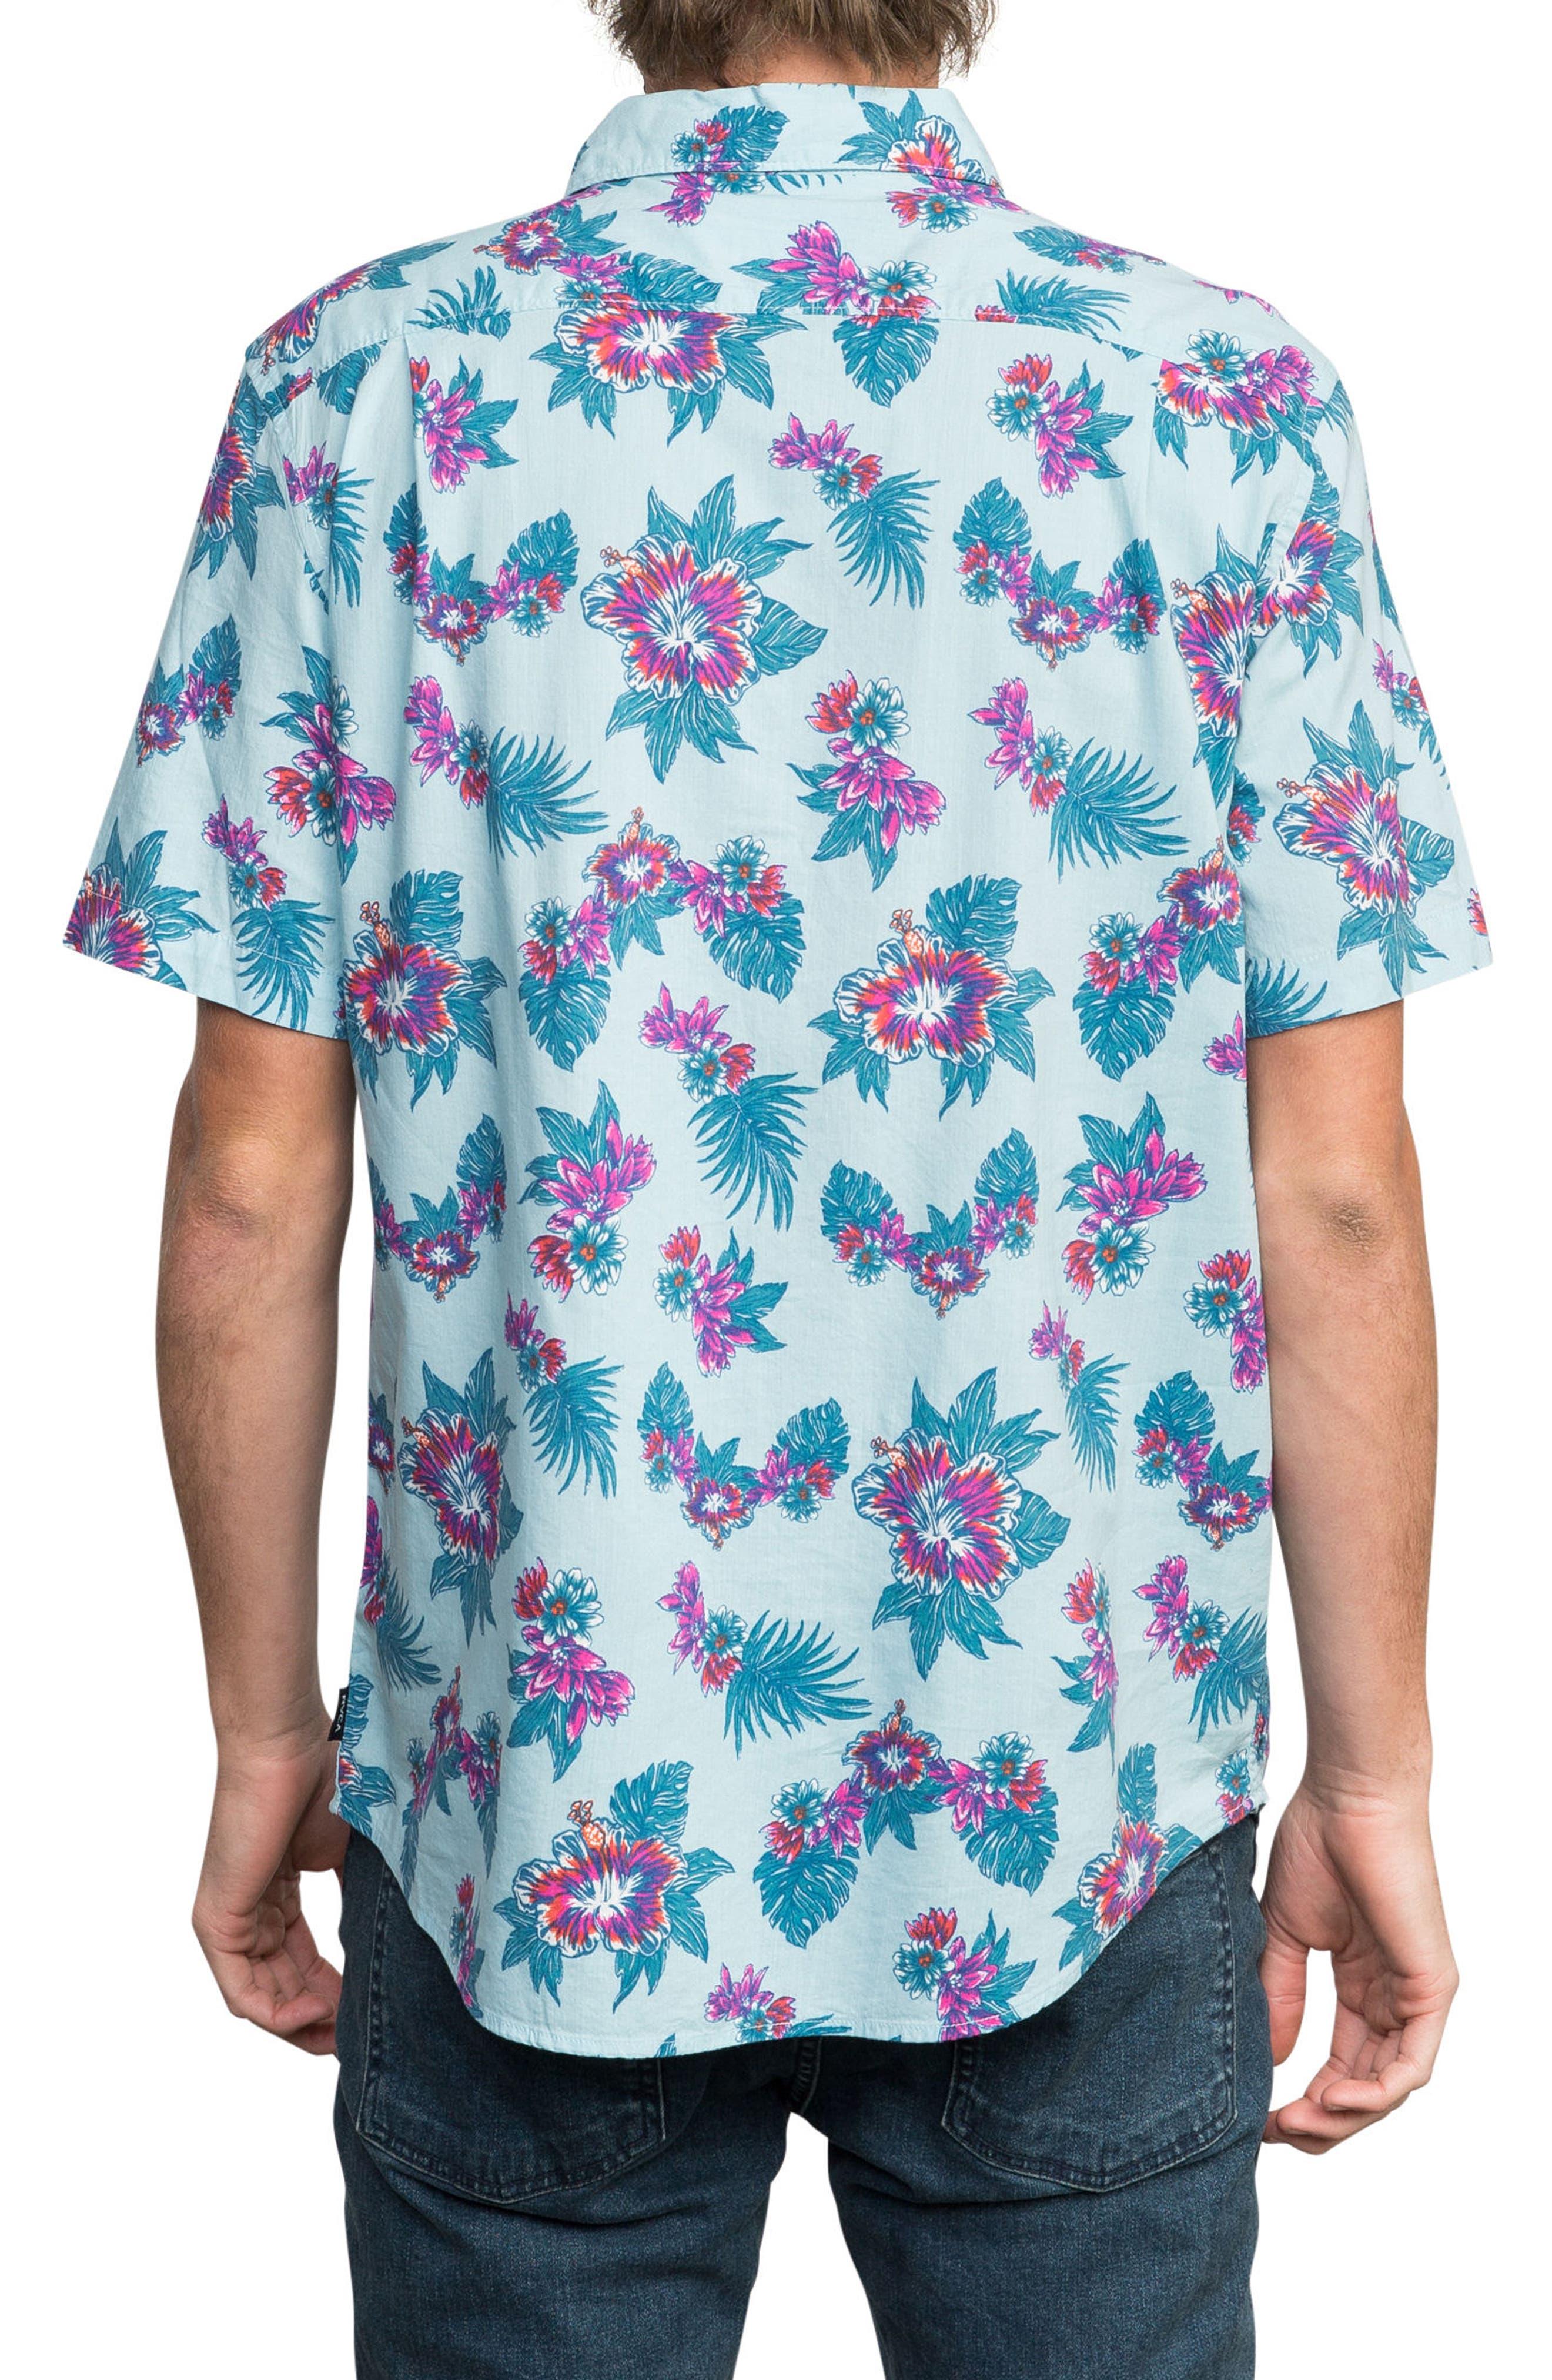 McMillan Floral Woven Shirt,                             Alternate thumbnail 2, color,                             Blue Floral